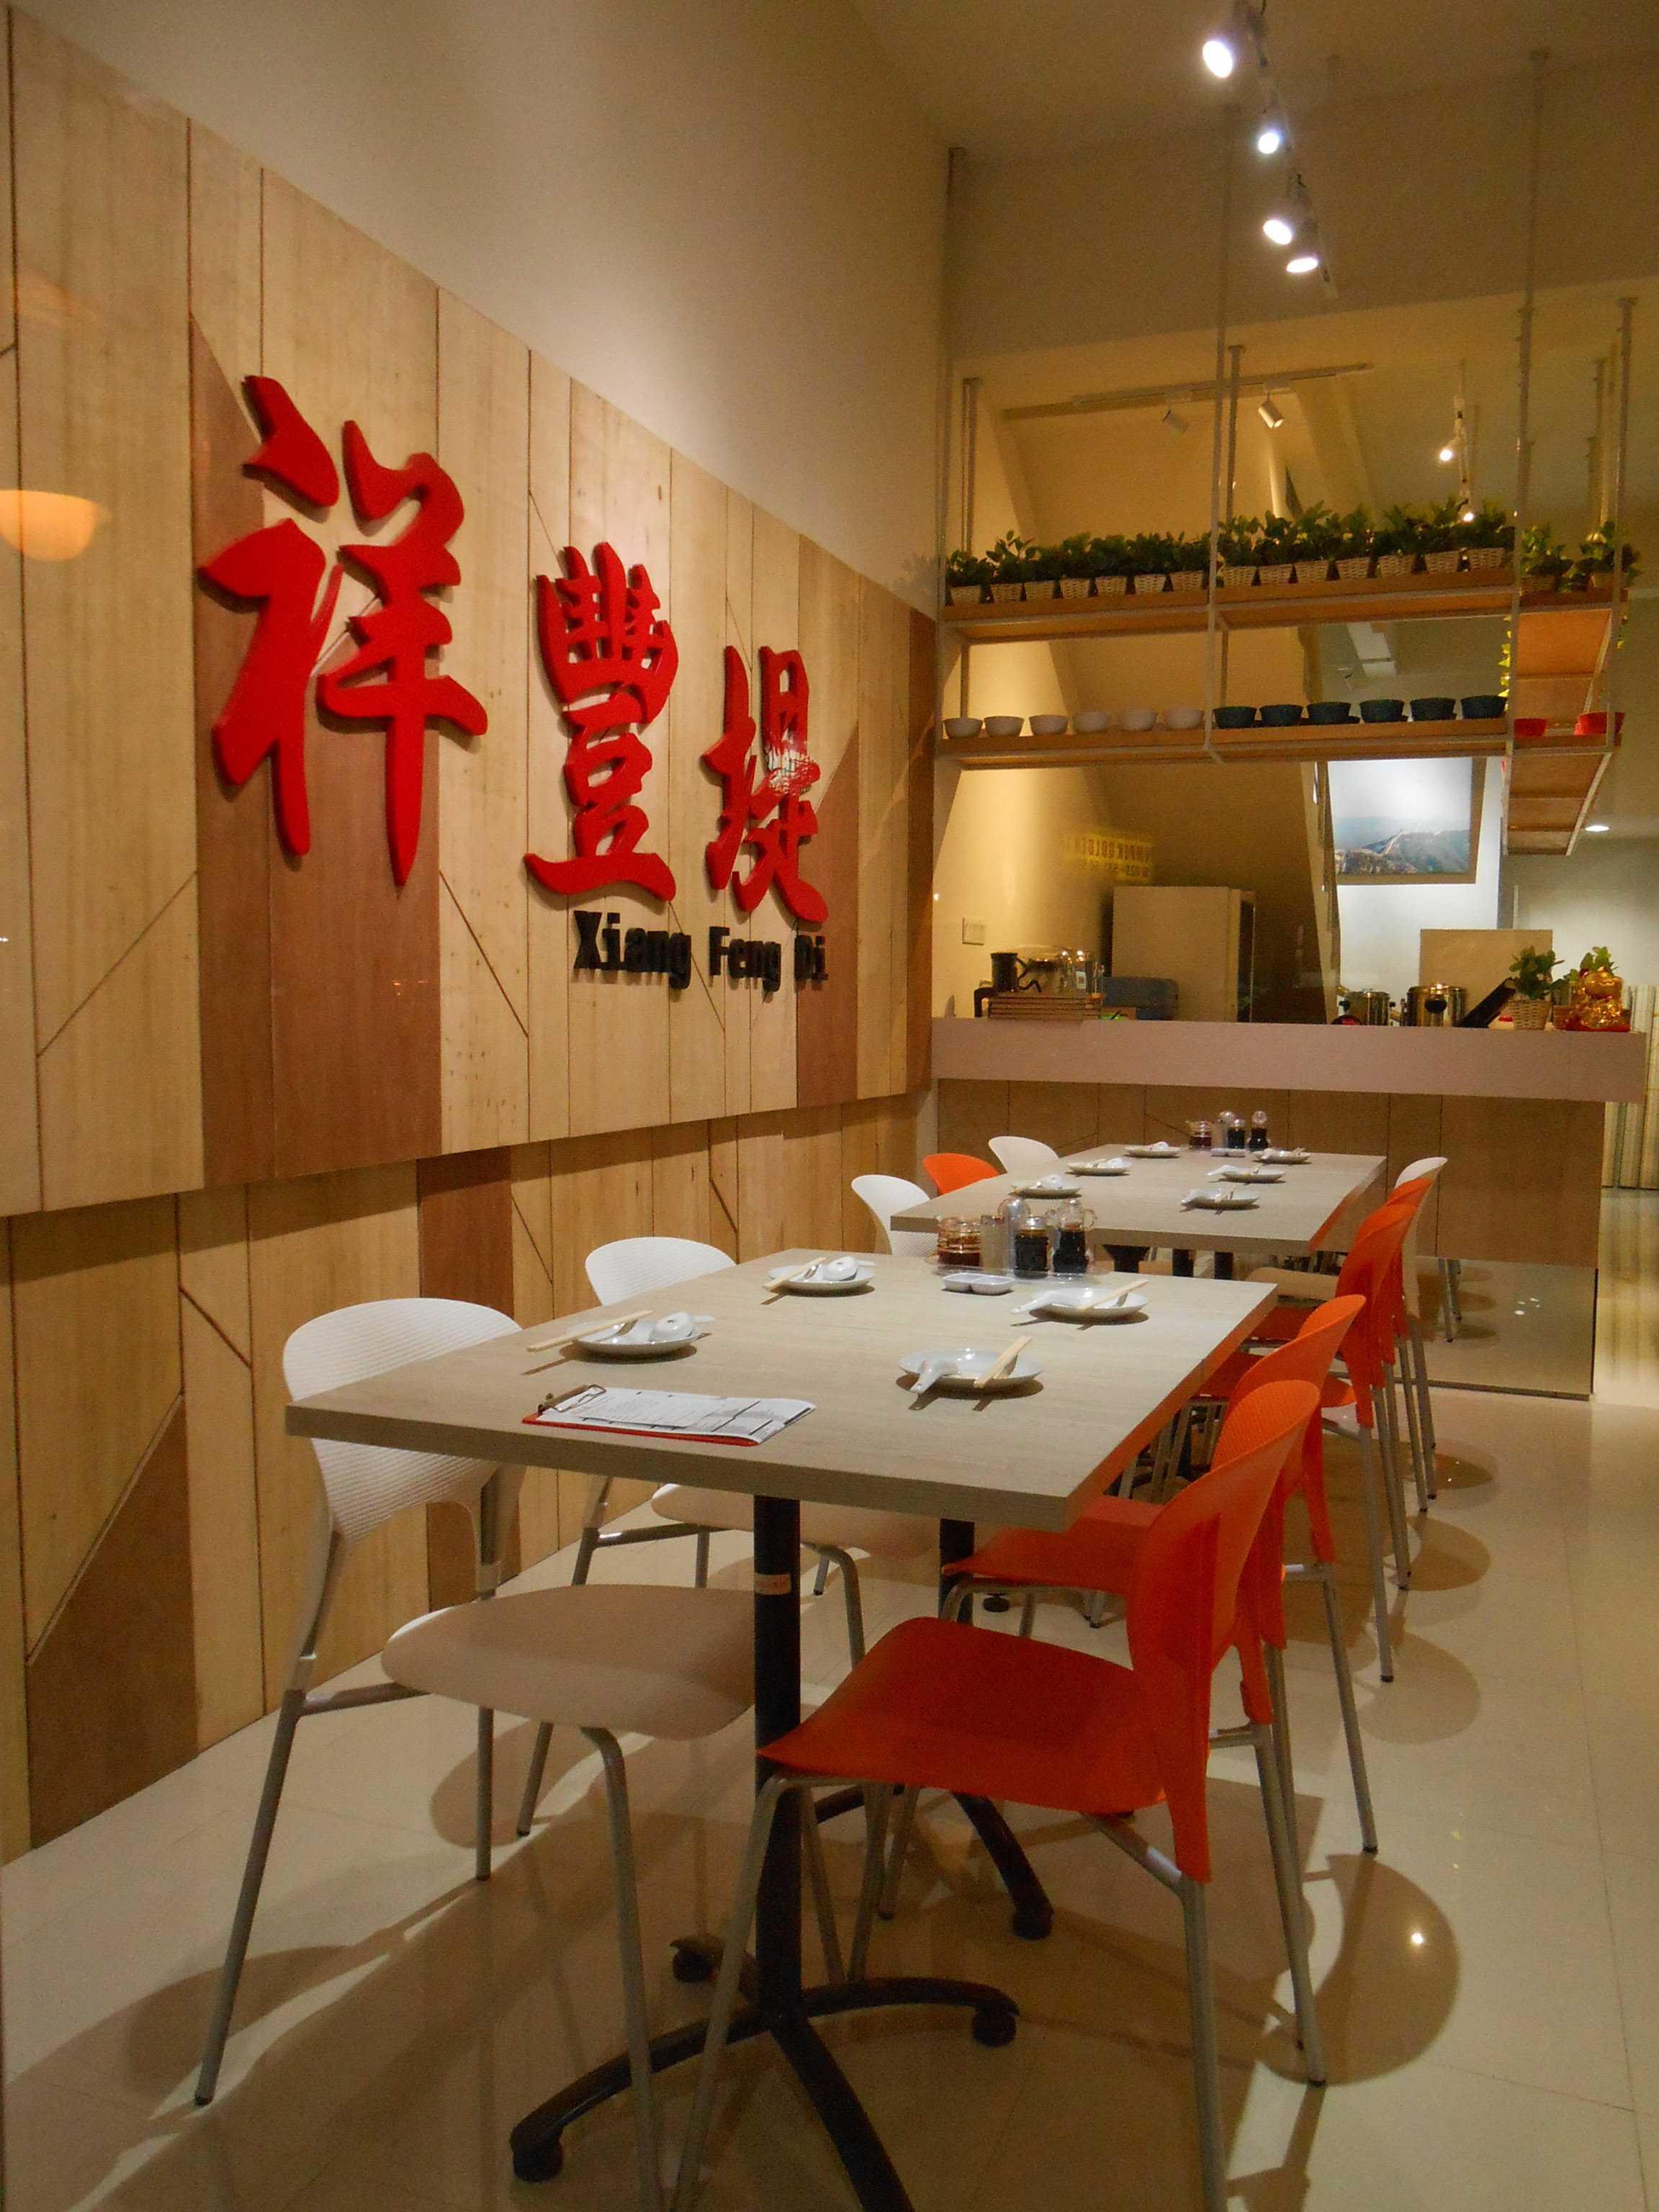 Studio Tektonik Resto Xian Feng Di Golden Boulevard, Jl. Raya Serpong, Lengkong Karya, Serpong Utara, Kota Tangerang Selatan, Banten 15310, Indonesia  007-Lr-2 Modern,asian  31681